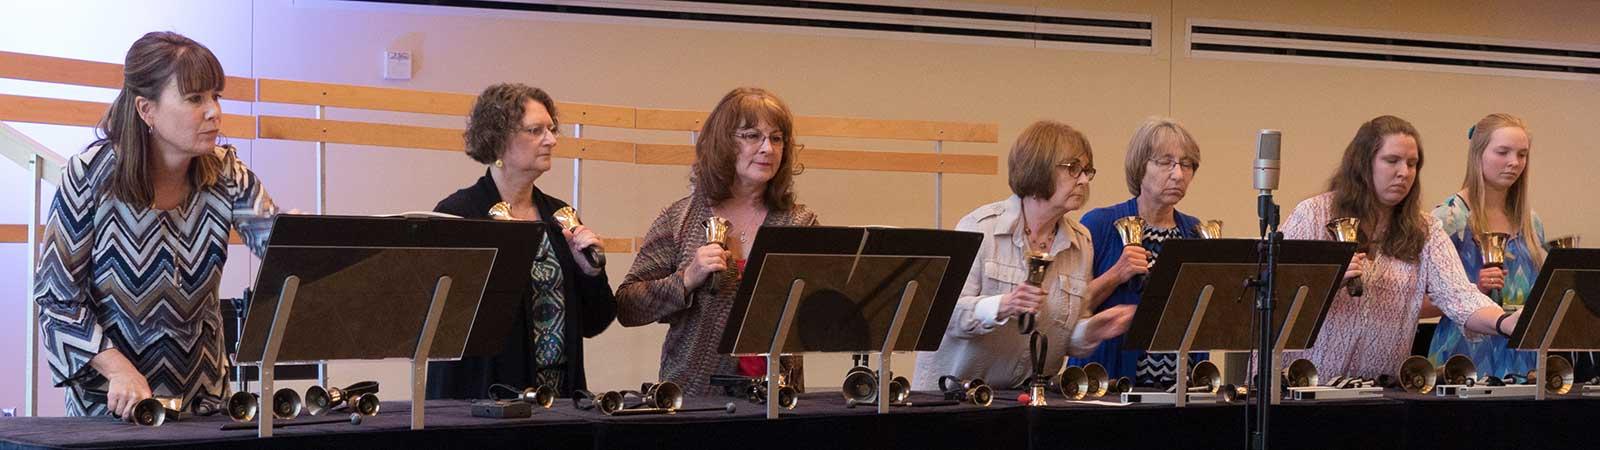 Carillon Bell Choir